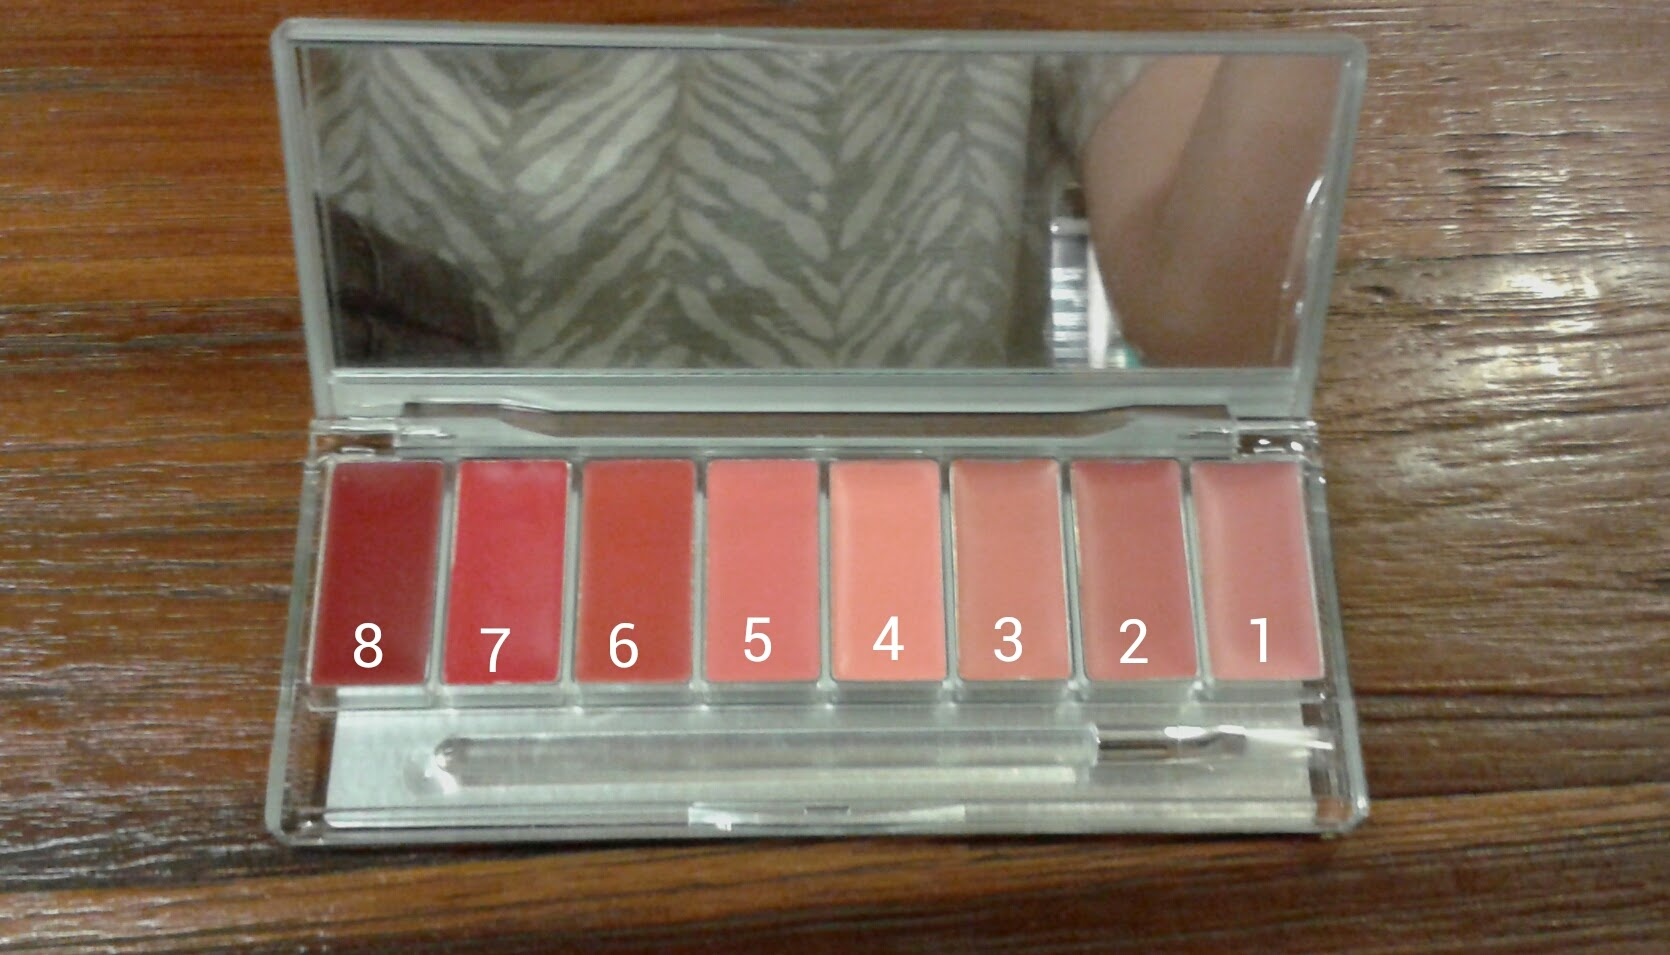 Wardah Lipstik Pallette Chocoa Holic Daftar Update Harga Terbaru Lip Palette Pinky Peach Jual Dou Beautystore Tokopedia Source Sumber